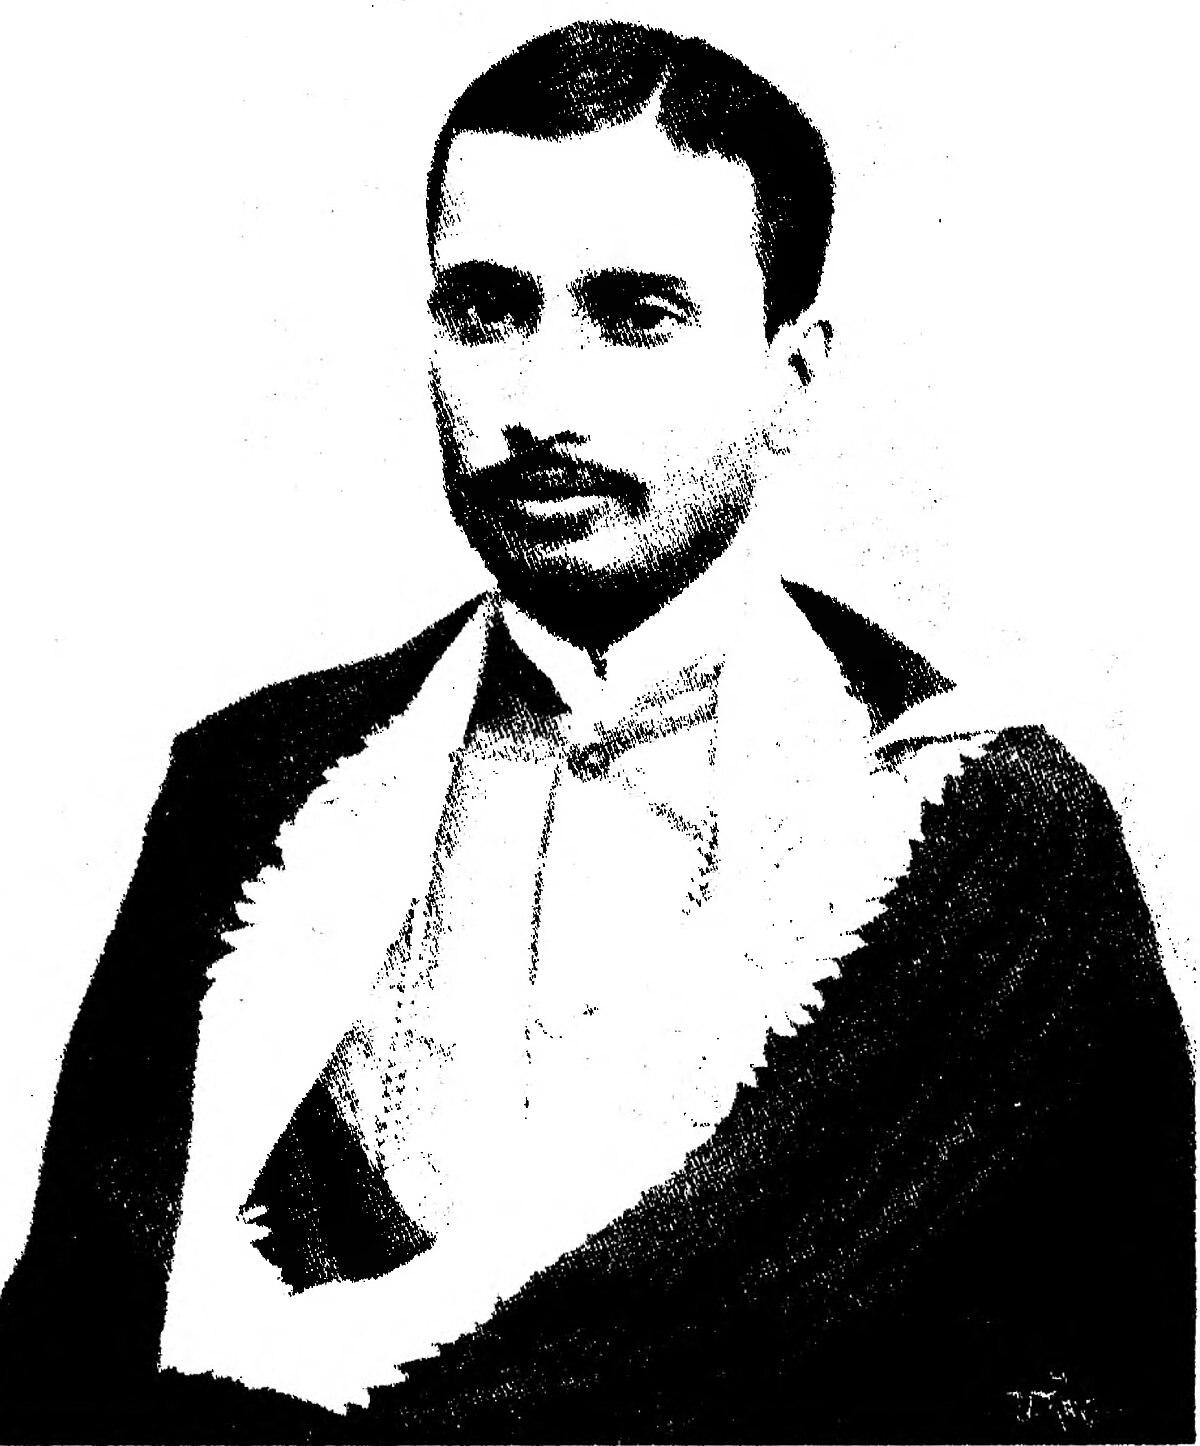 akshay kumar boral wikipedia